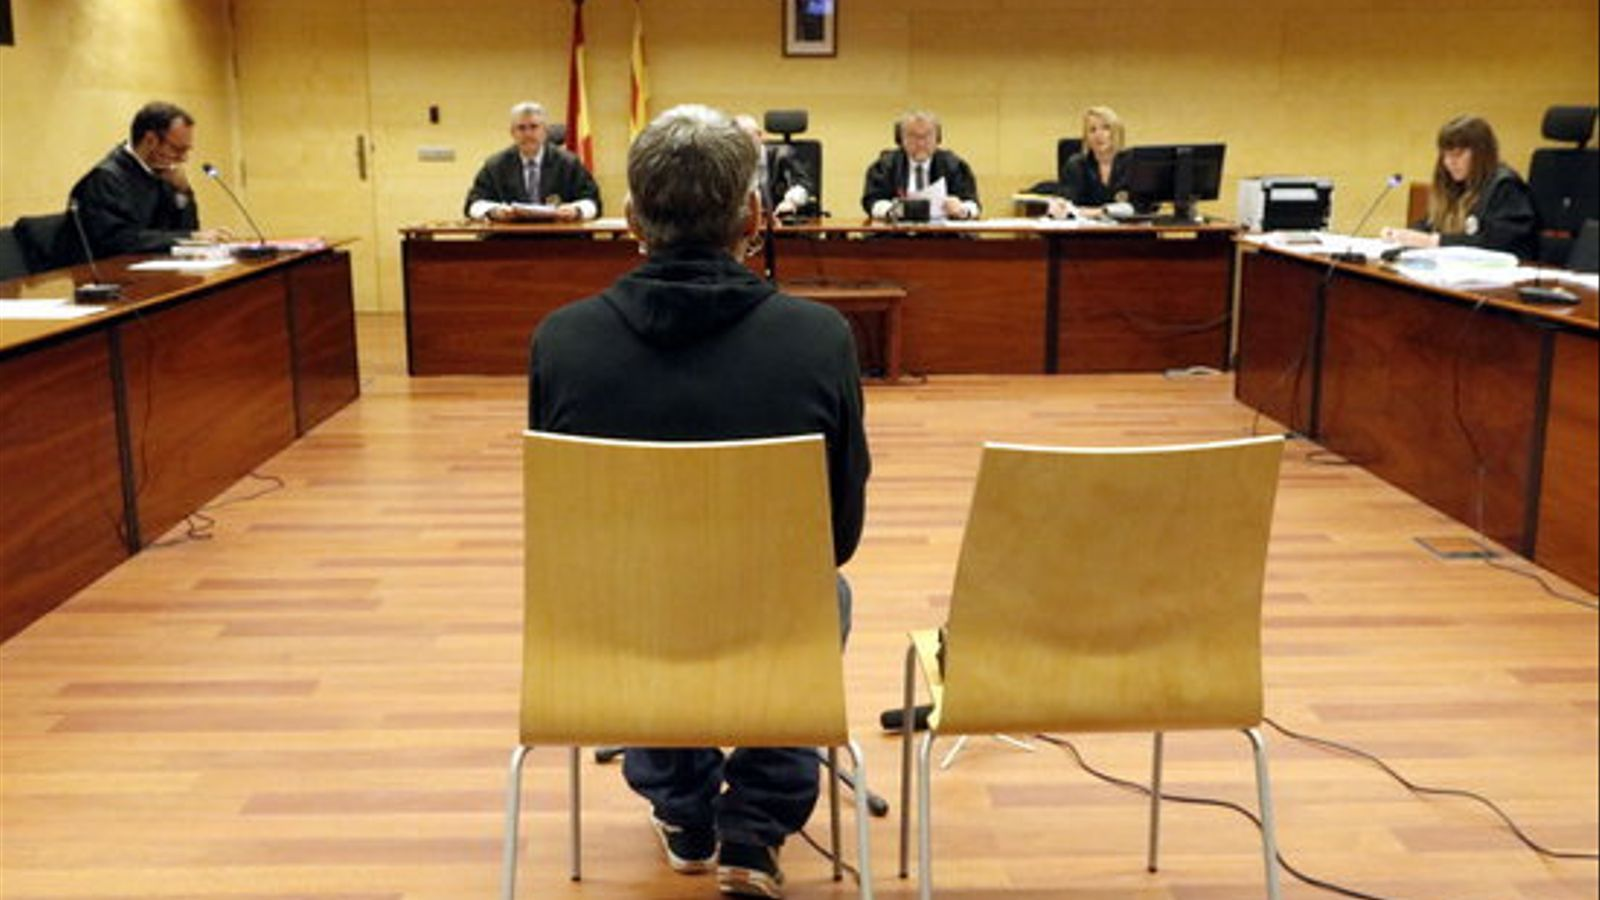 El condemnat, durant el judici. / ACN